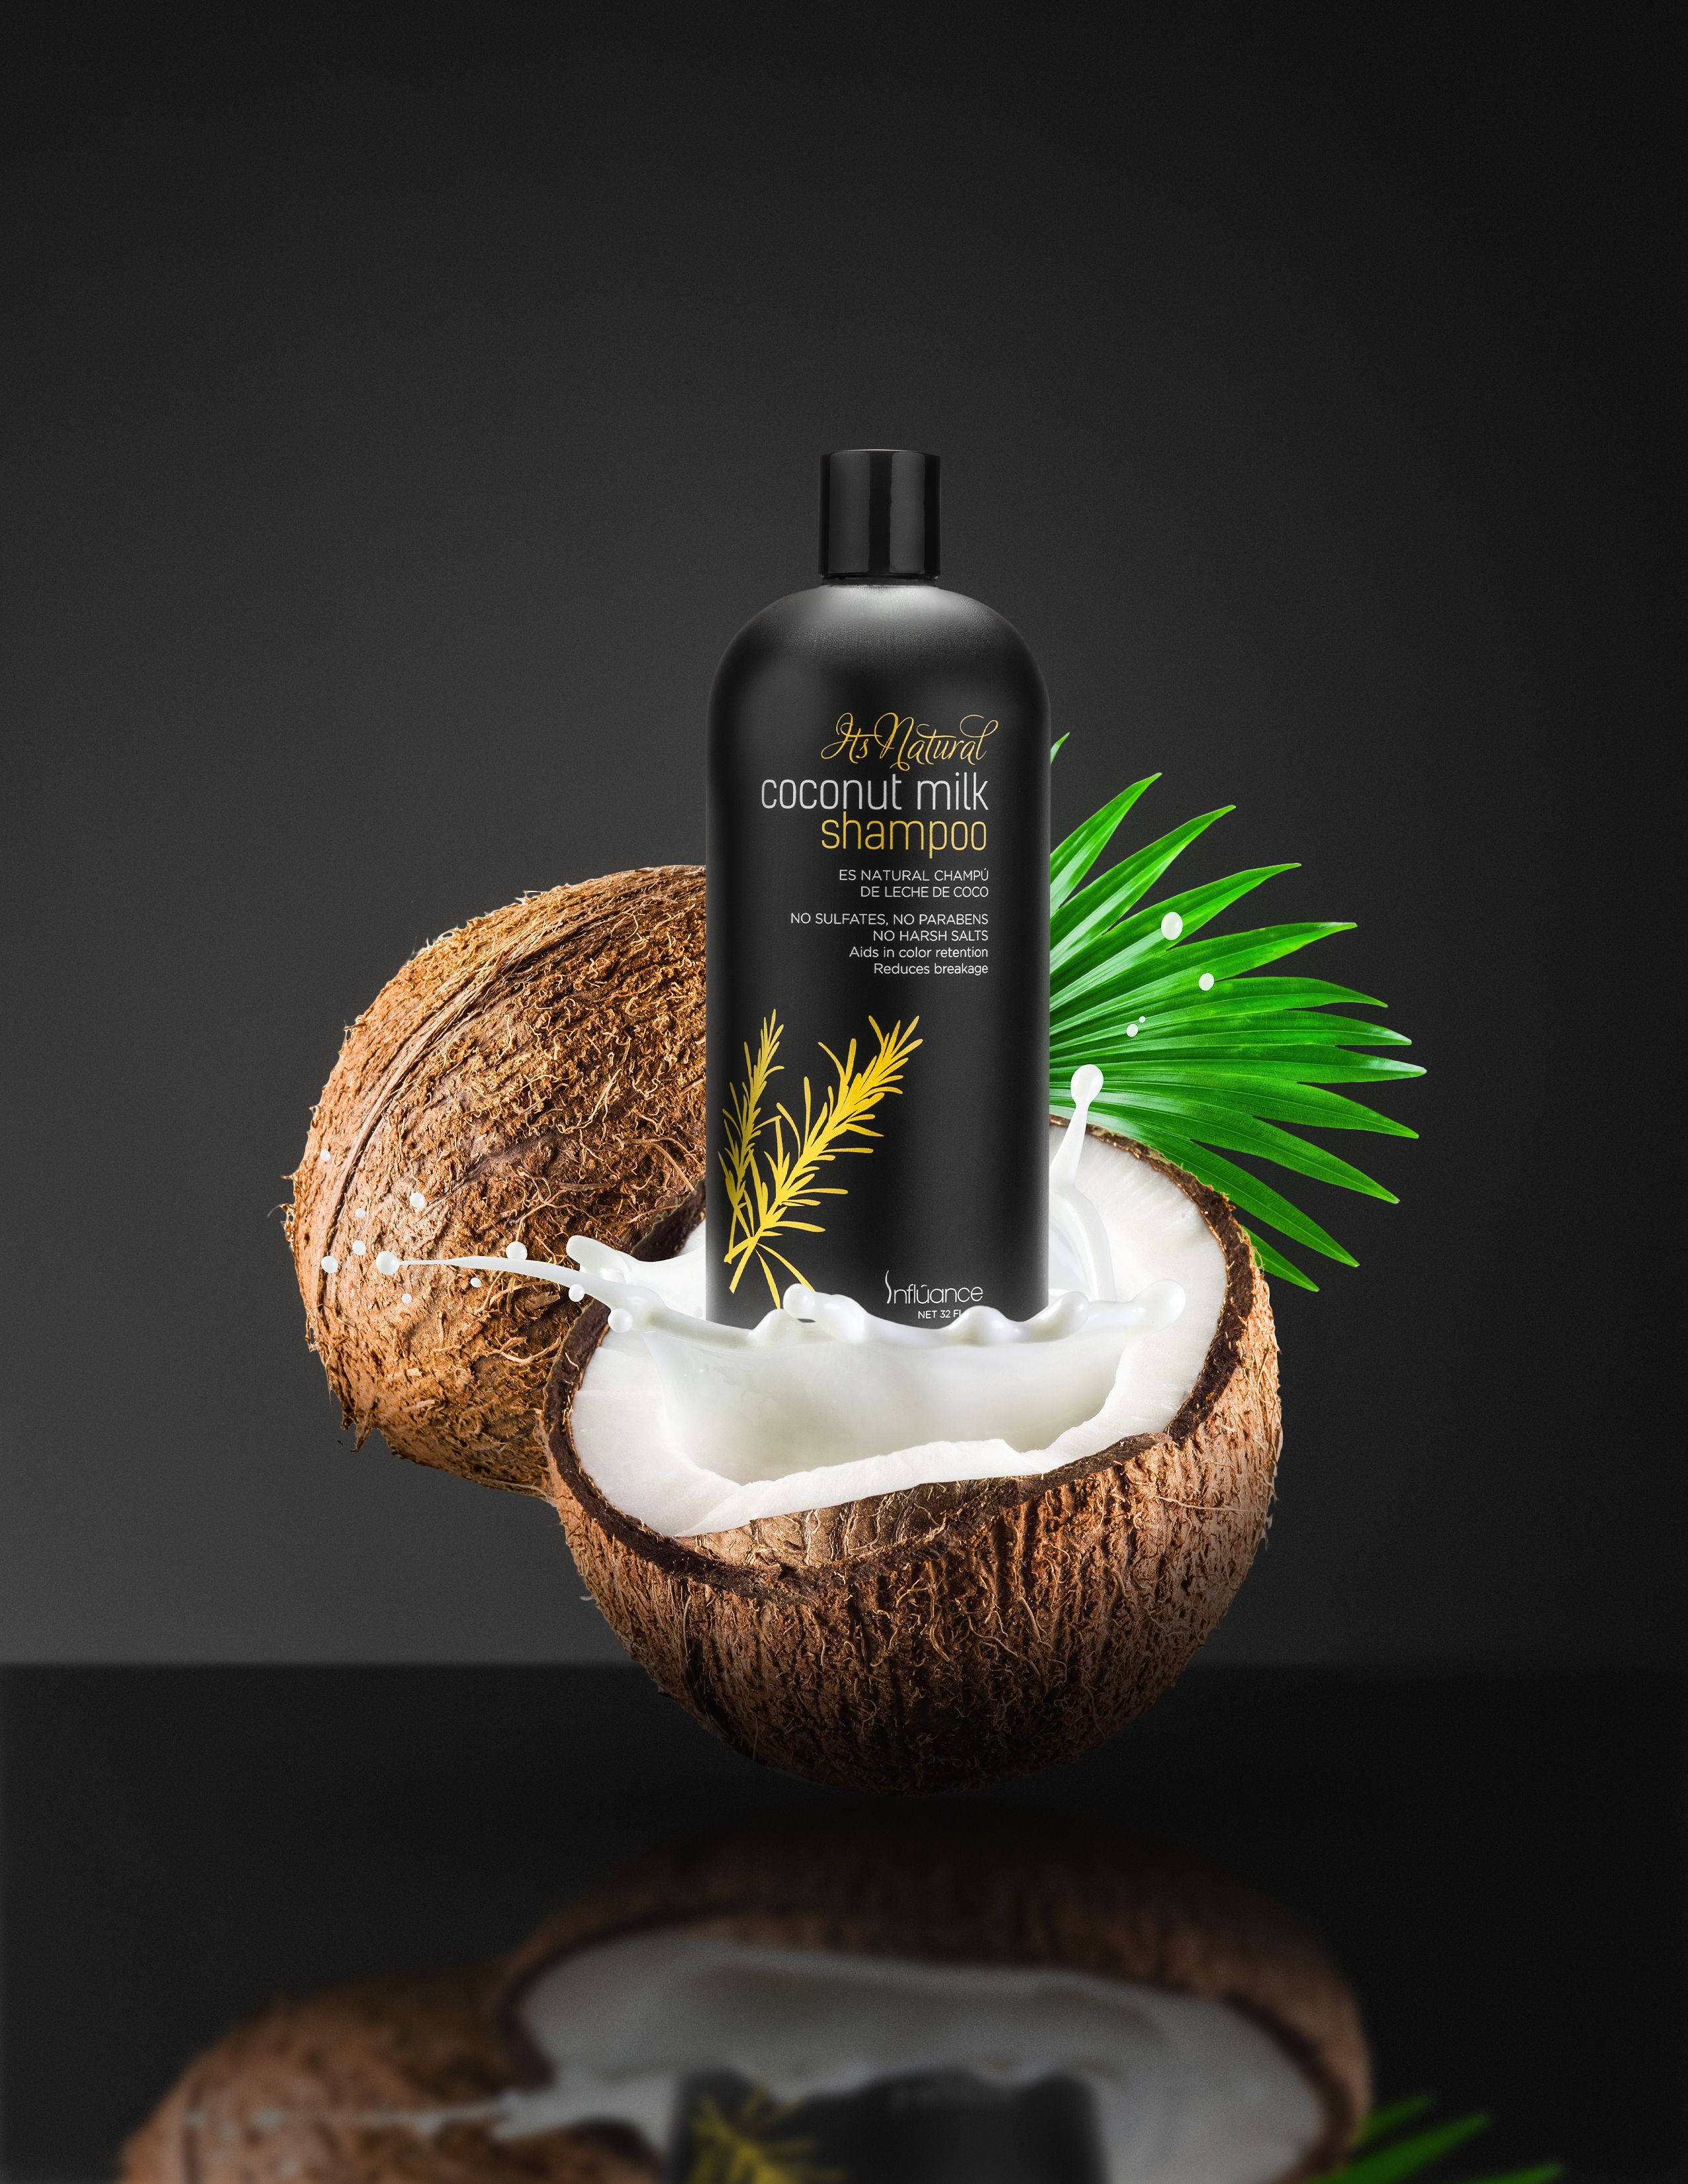 It's Natural Coconut Milk Shampoo 8oz Coconut milk